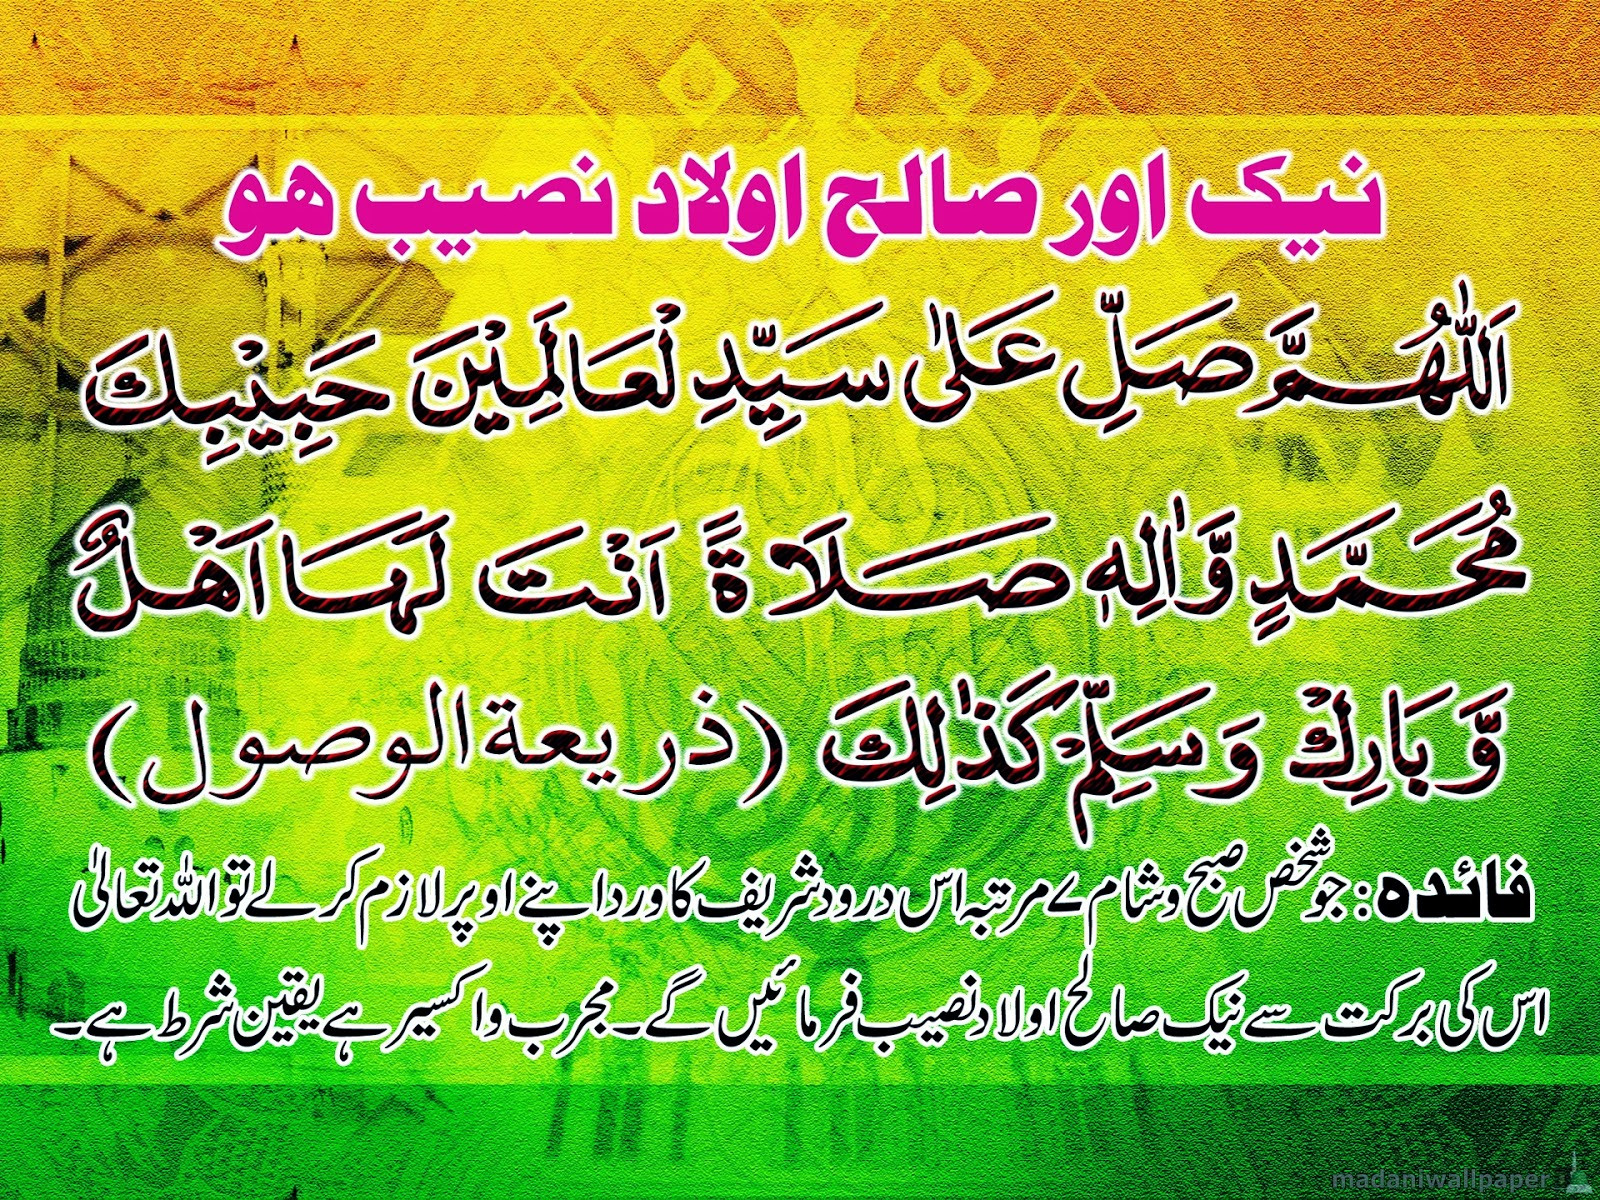 Darood E Pak Sami Yusuf Mp3 free download